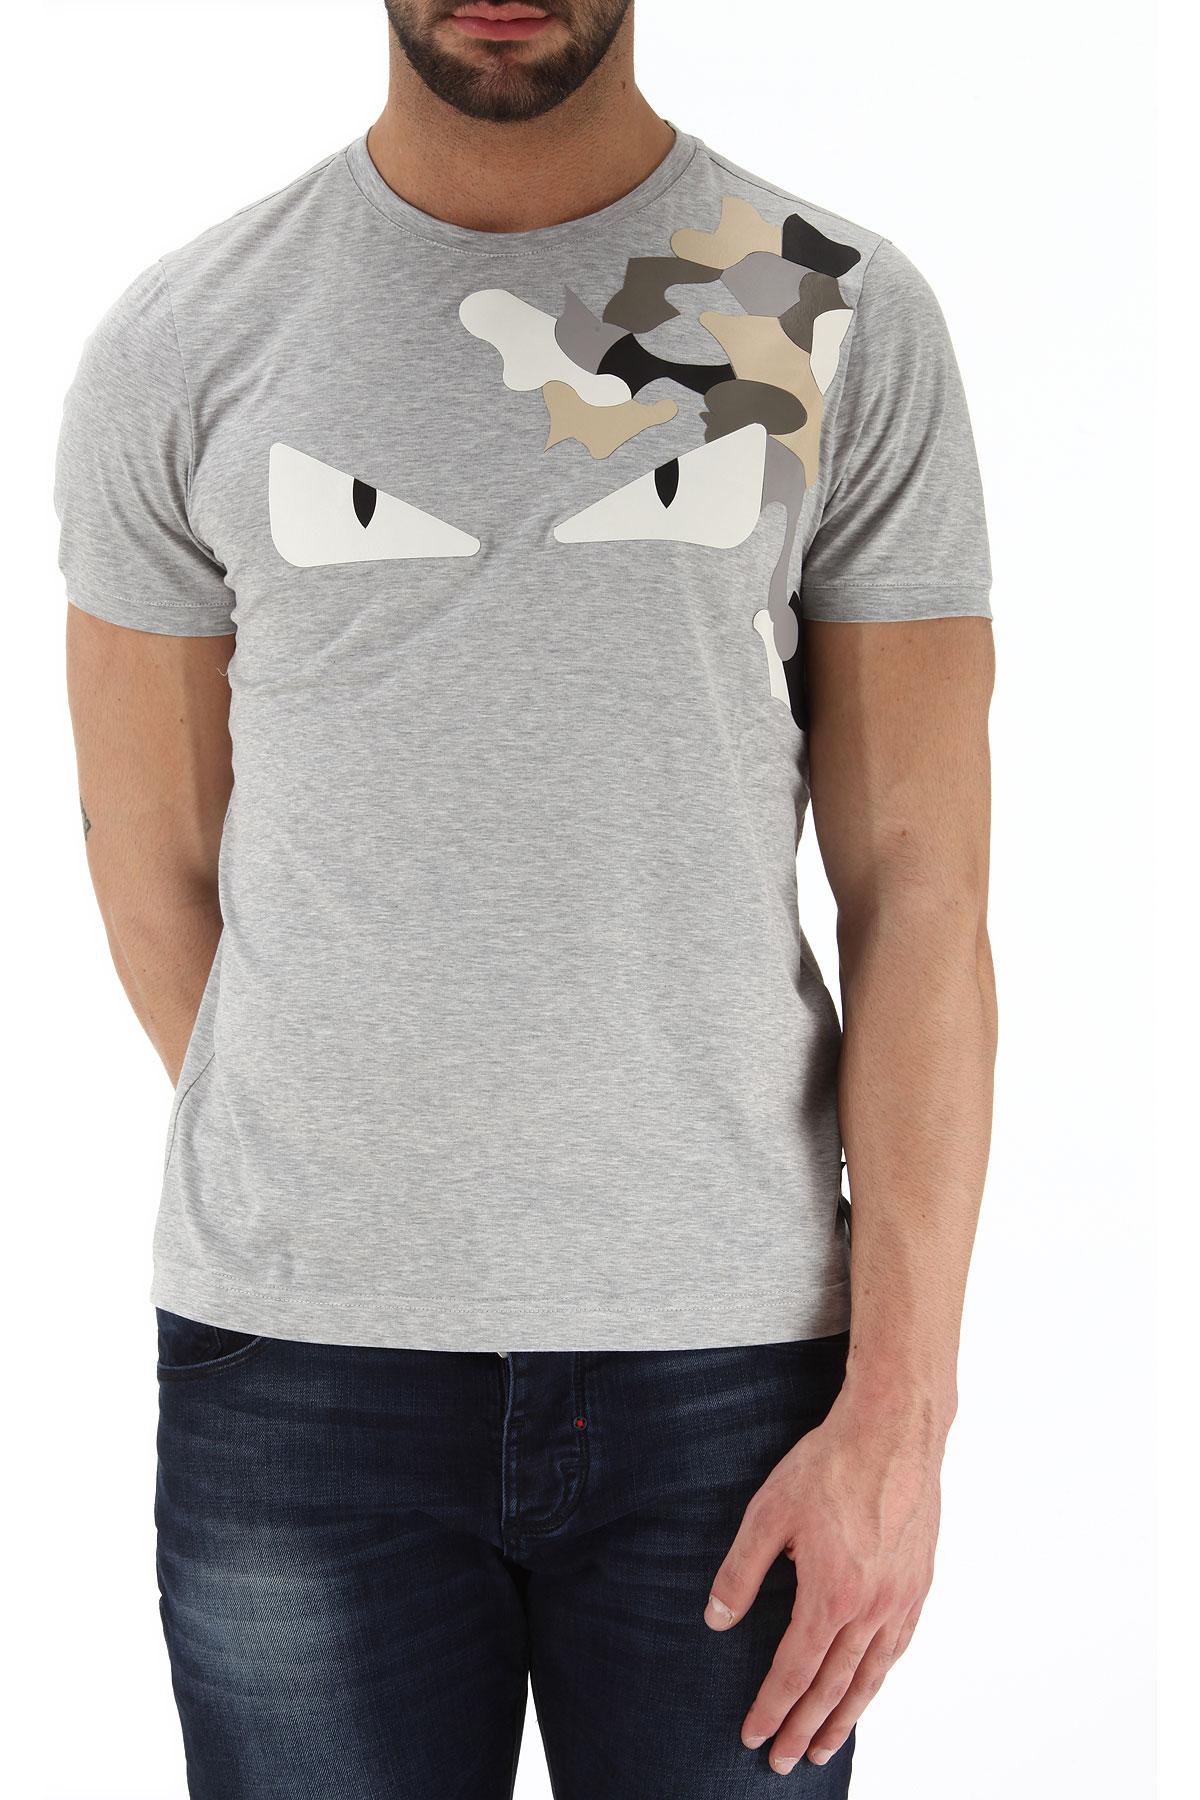 Mens Clothing Fendi, Style code: fy0626-44k-f0wg5